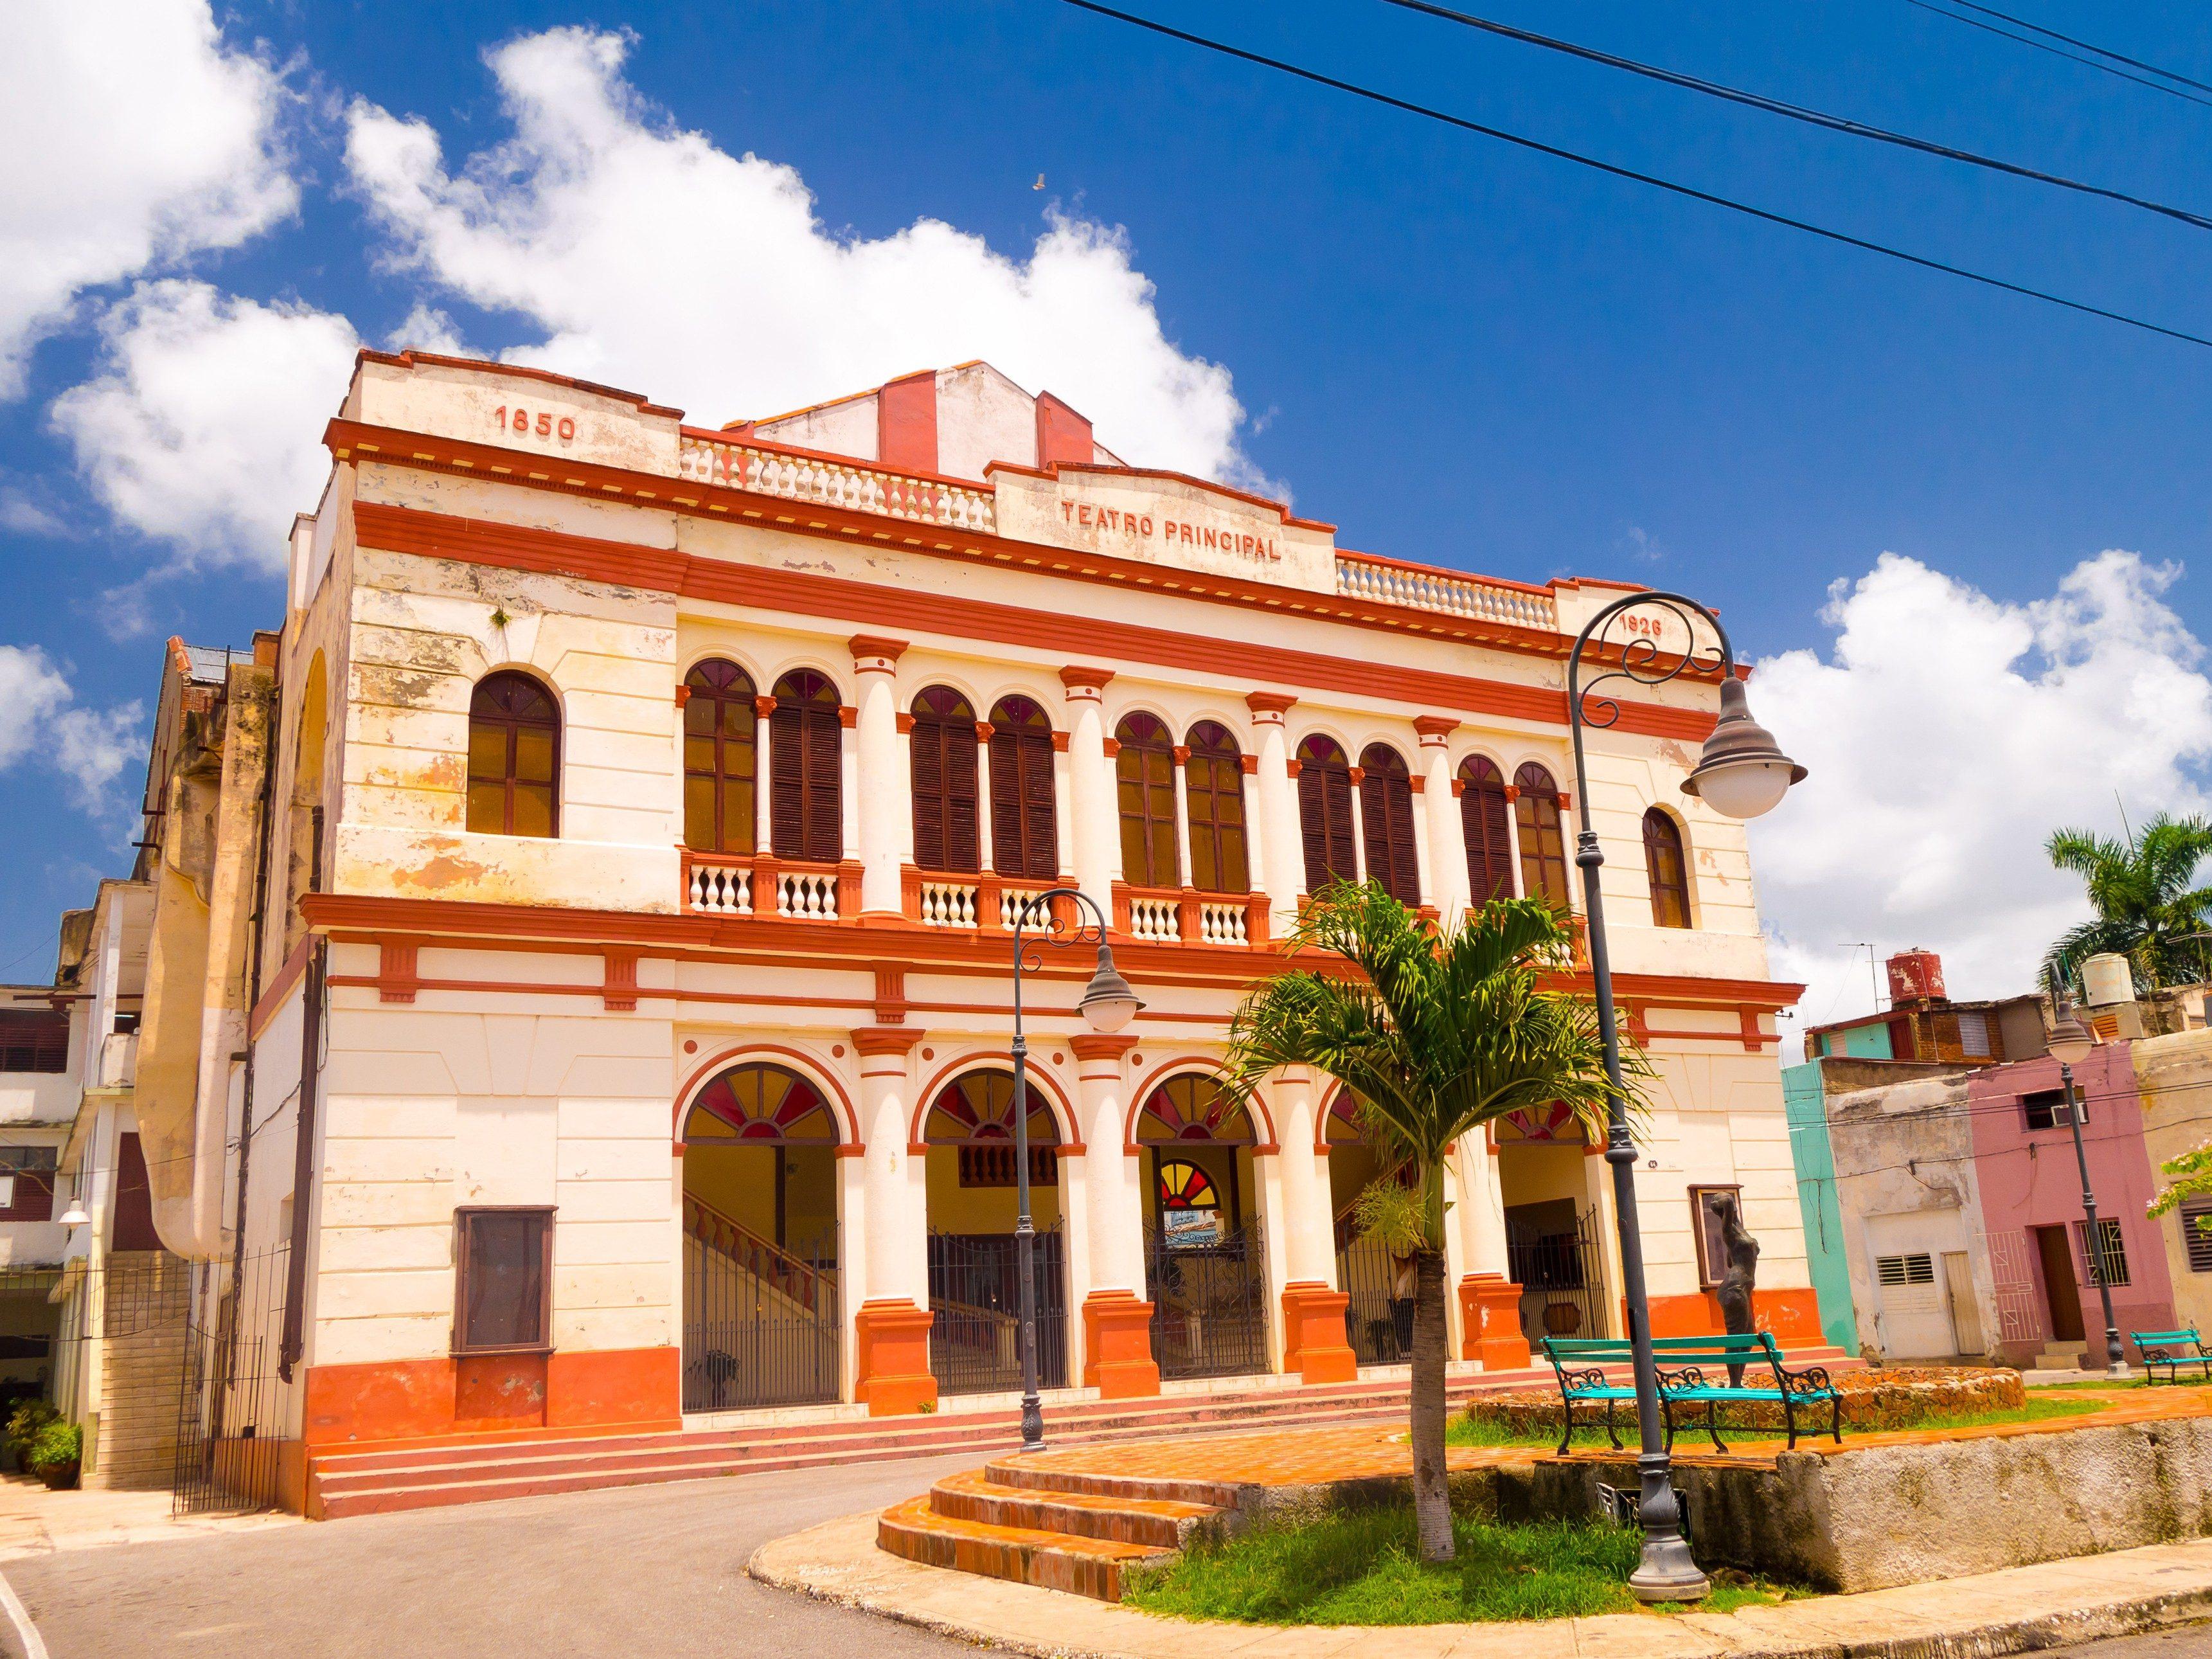 7. Camaguey, Cuba